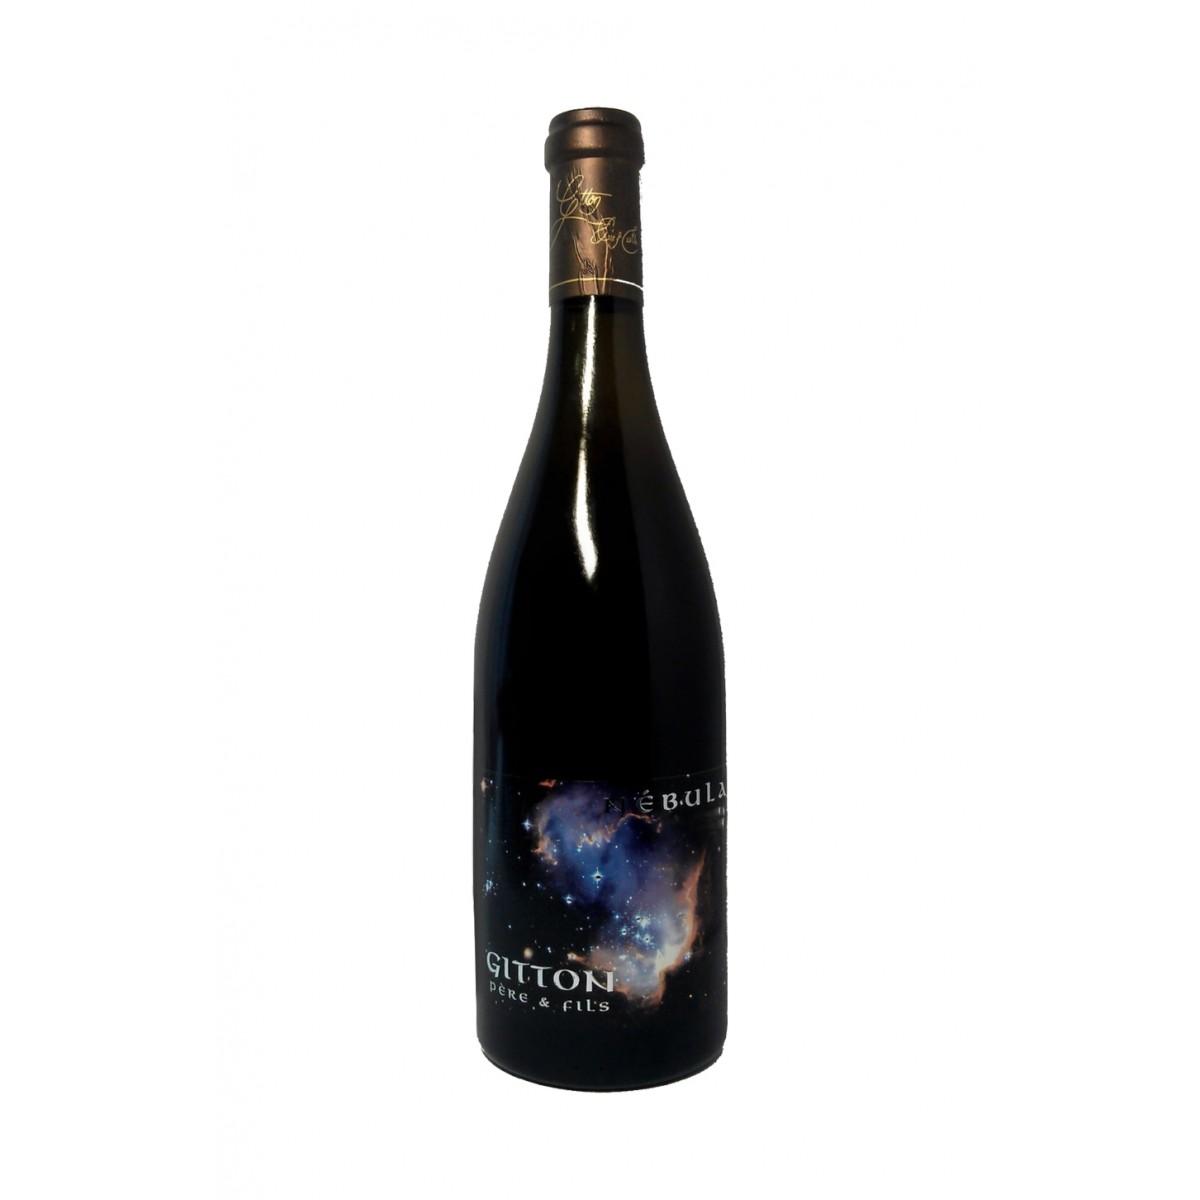 Pouilly-Fumé Nebula 2016 - Gitton Père et Fils